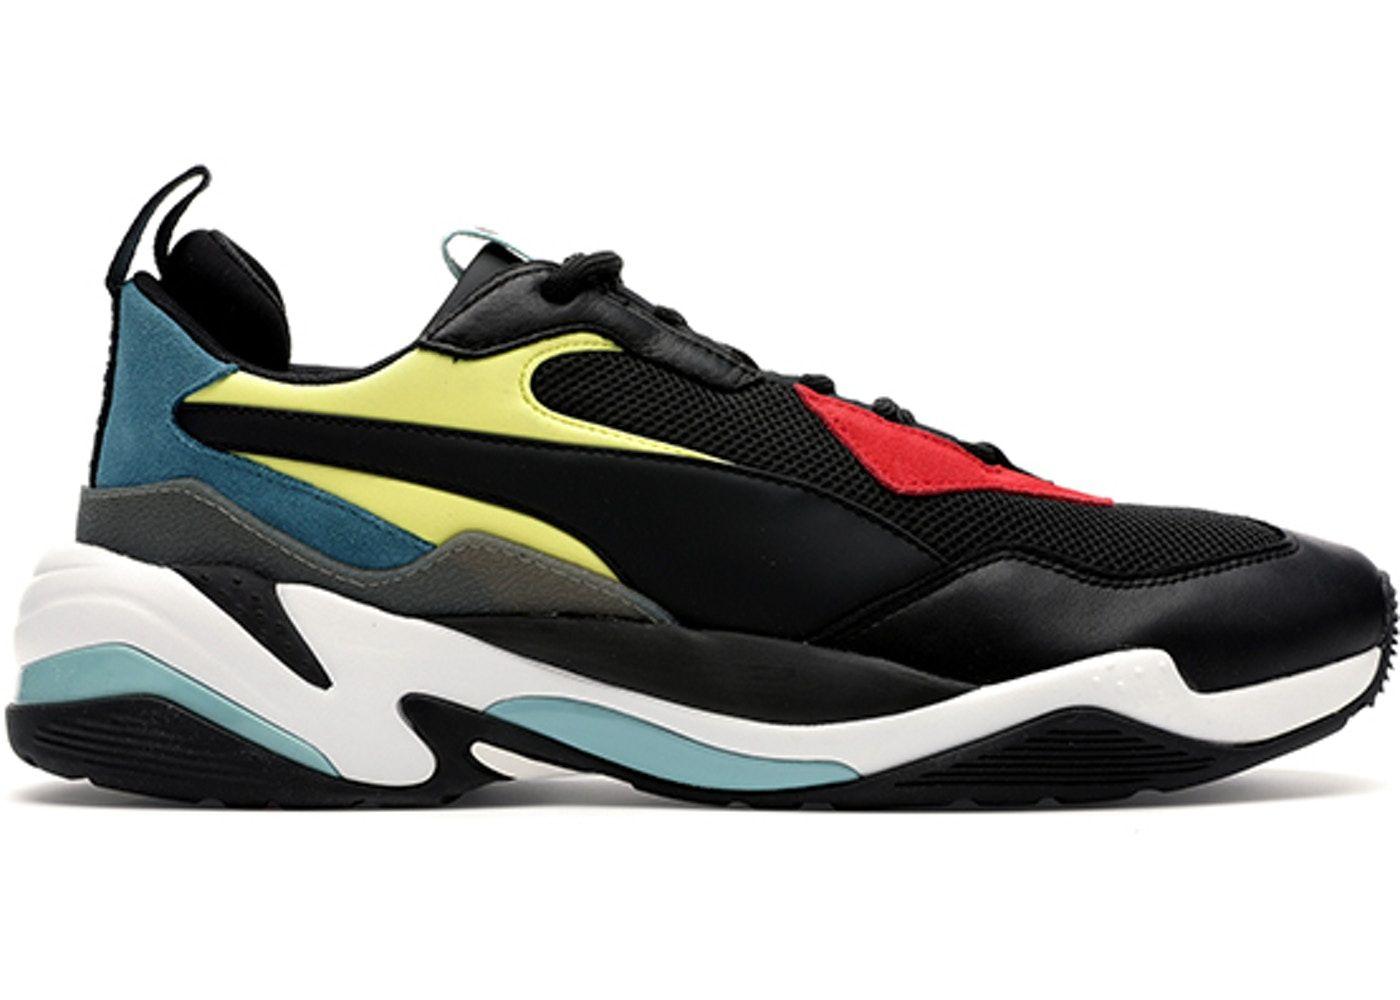 Puma Thunder Spectra Black | Sneakers